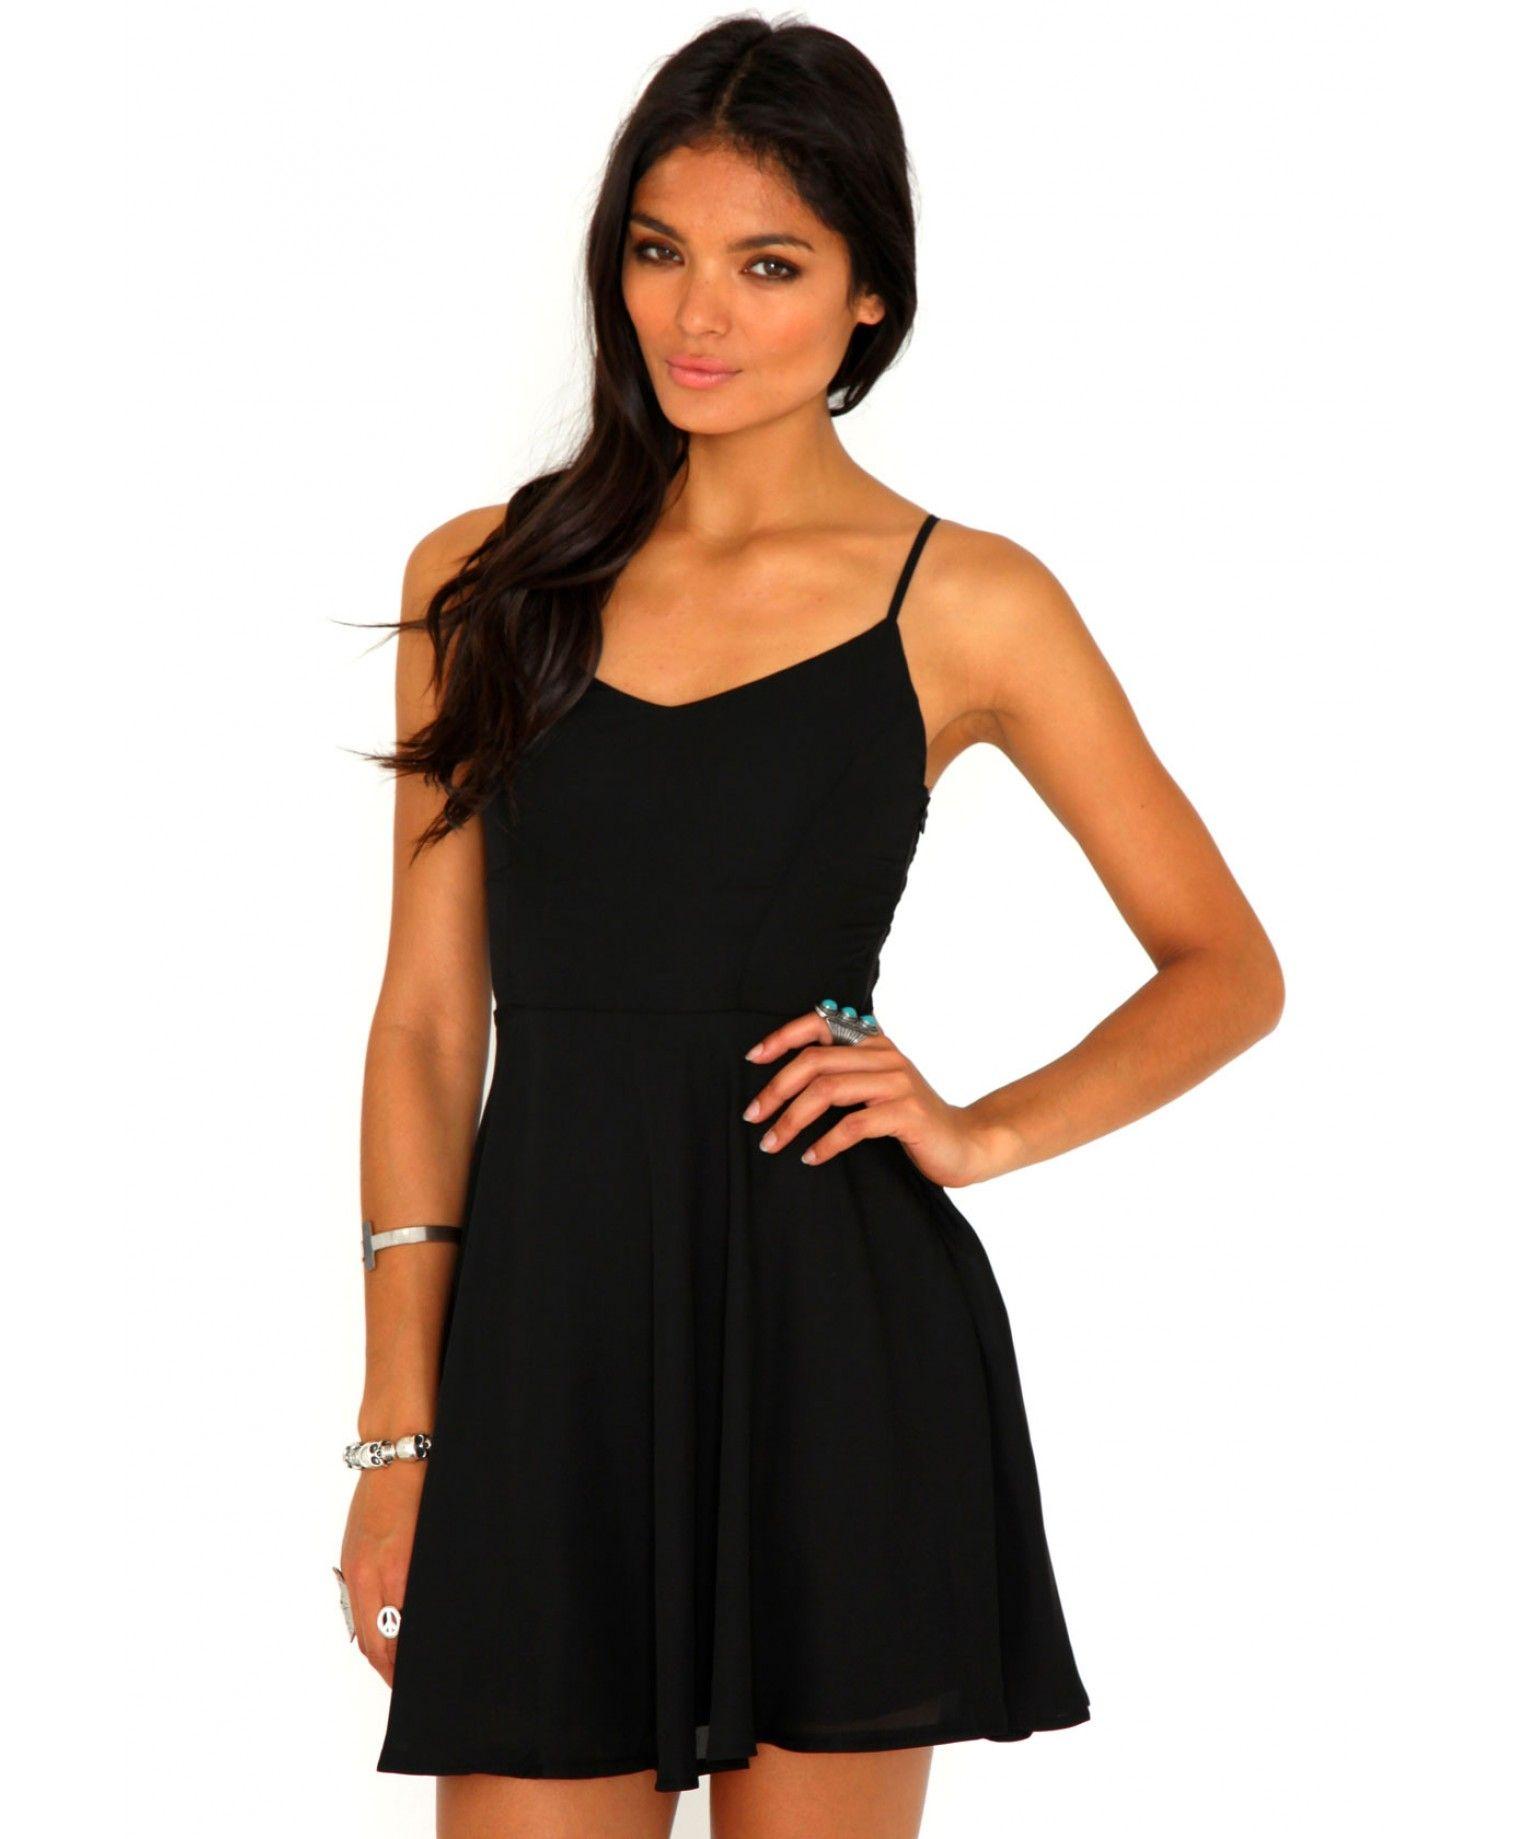 9f815763f Paula Caged Back Skater Dress - Dresses - Missguided   stylize